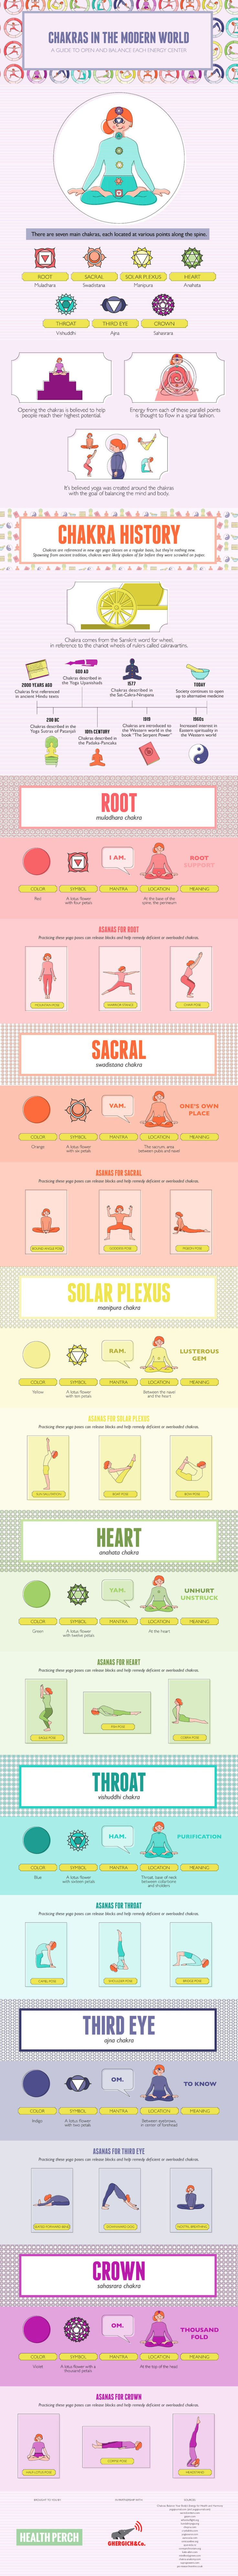 Balance Your 7 Chakras With These Yoga Poses & Mantras (Infographic) - mindbodygreen.com